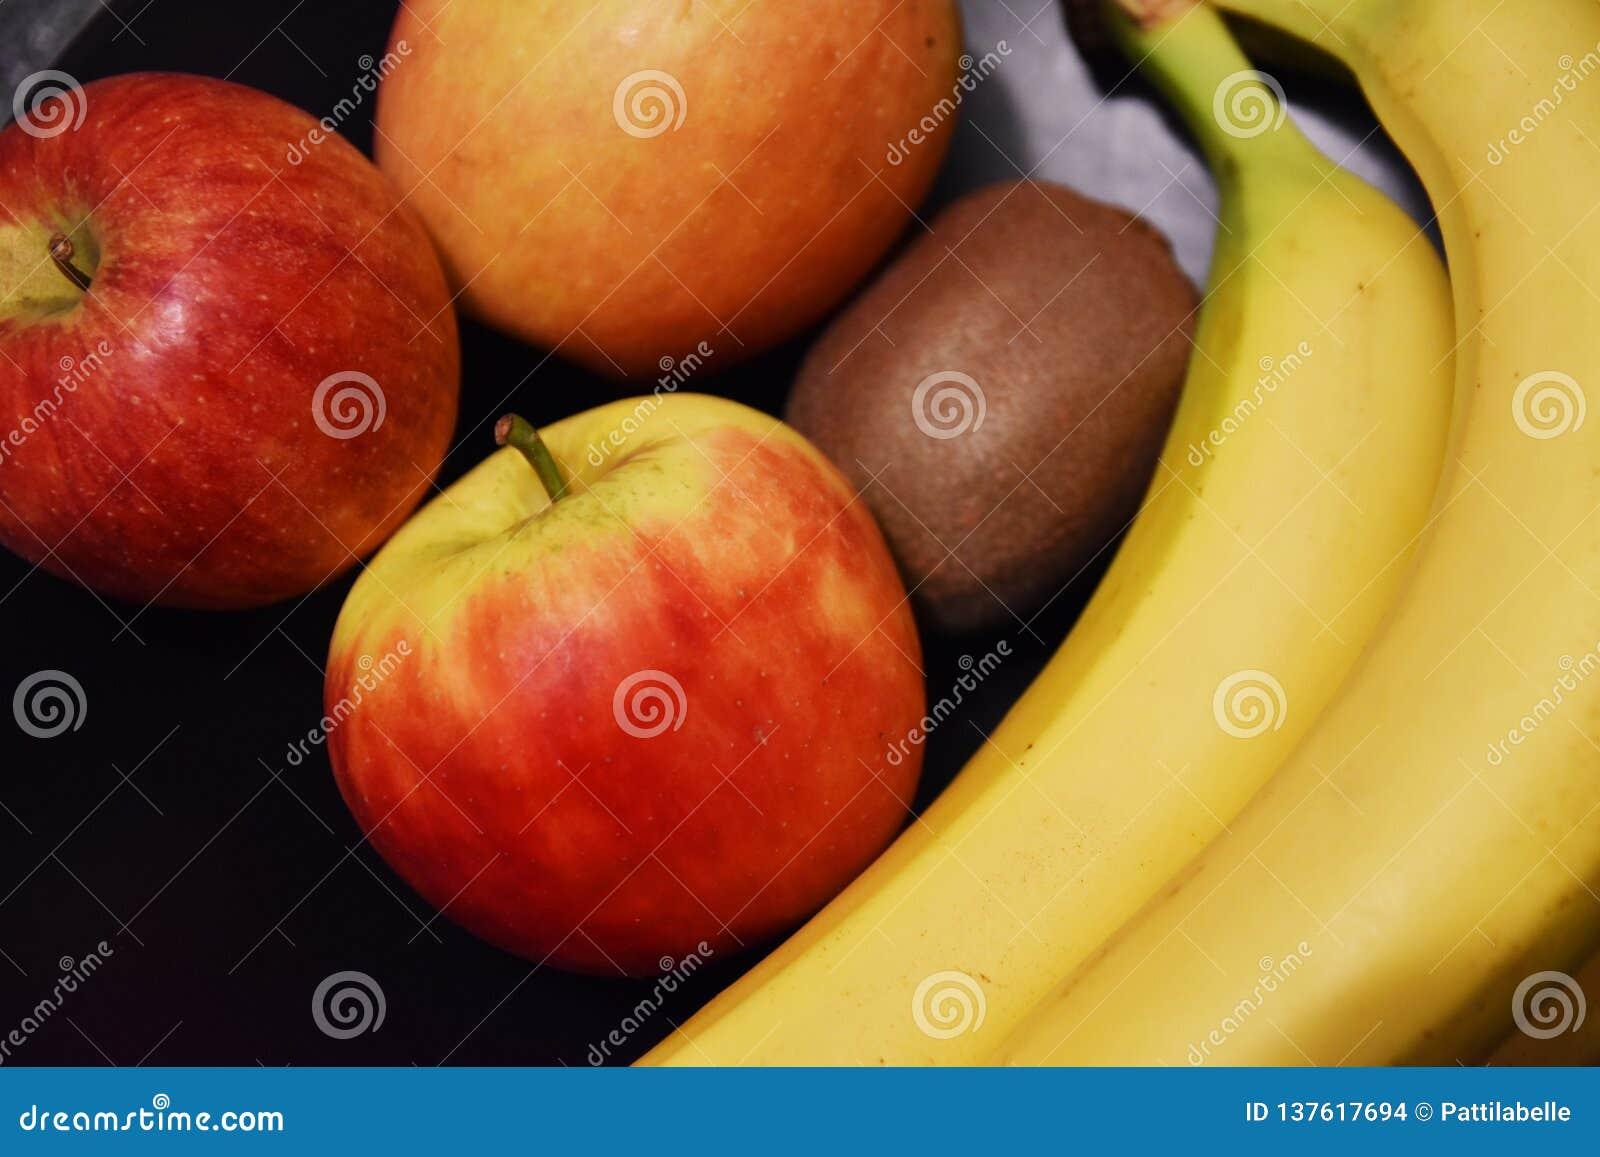 Fruit mix - bananas apples kiwis